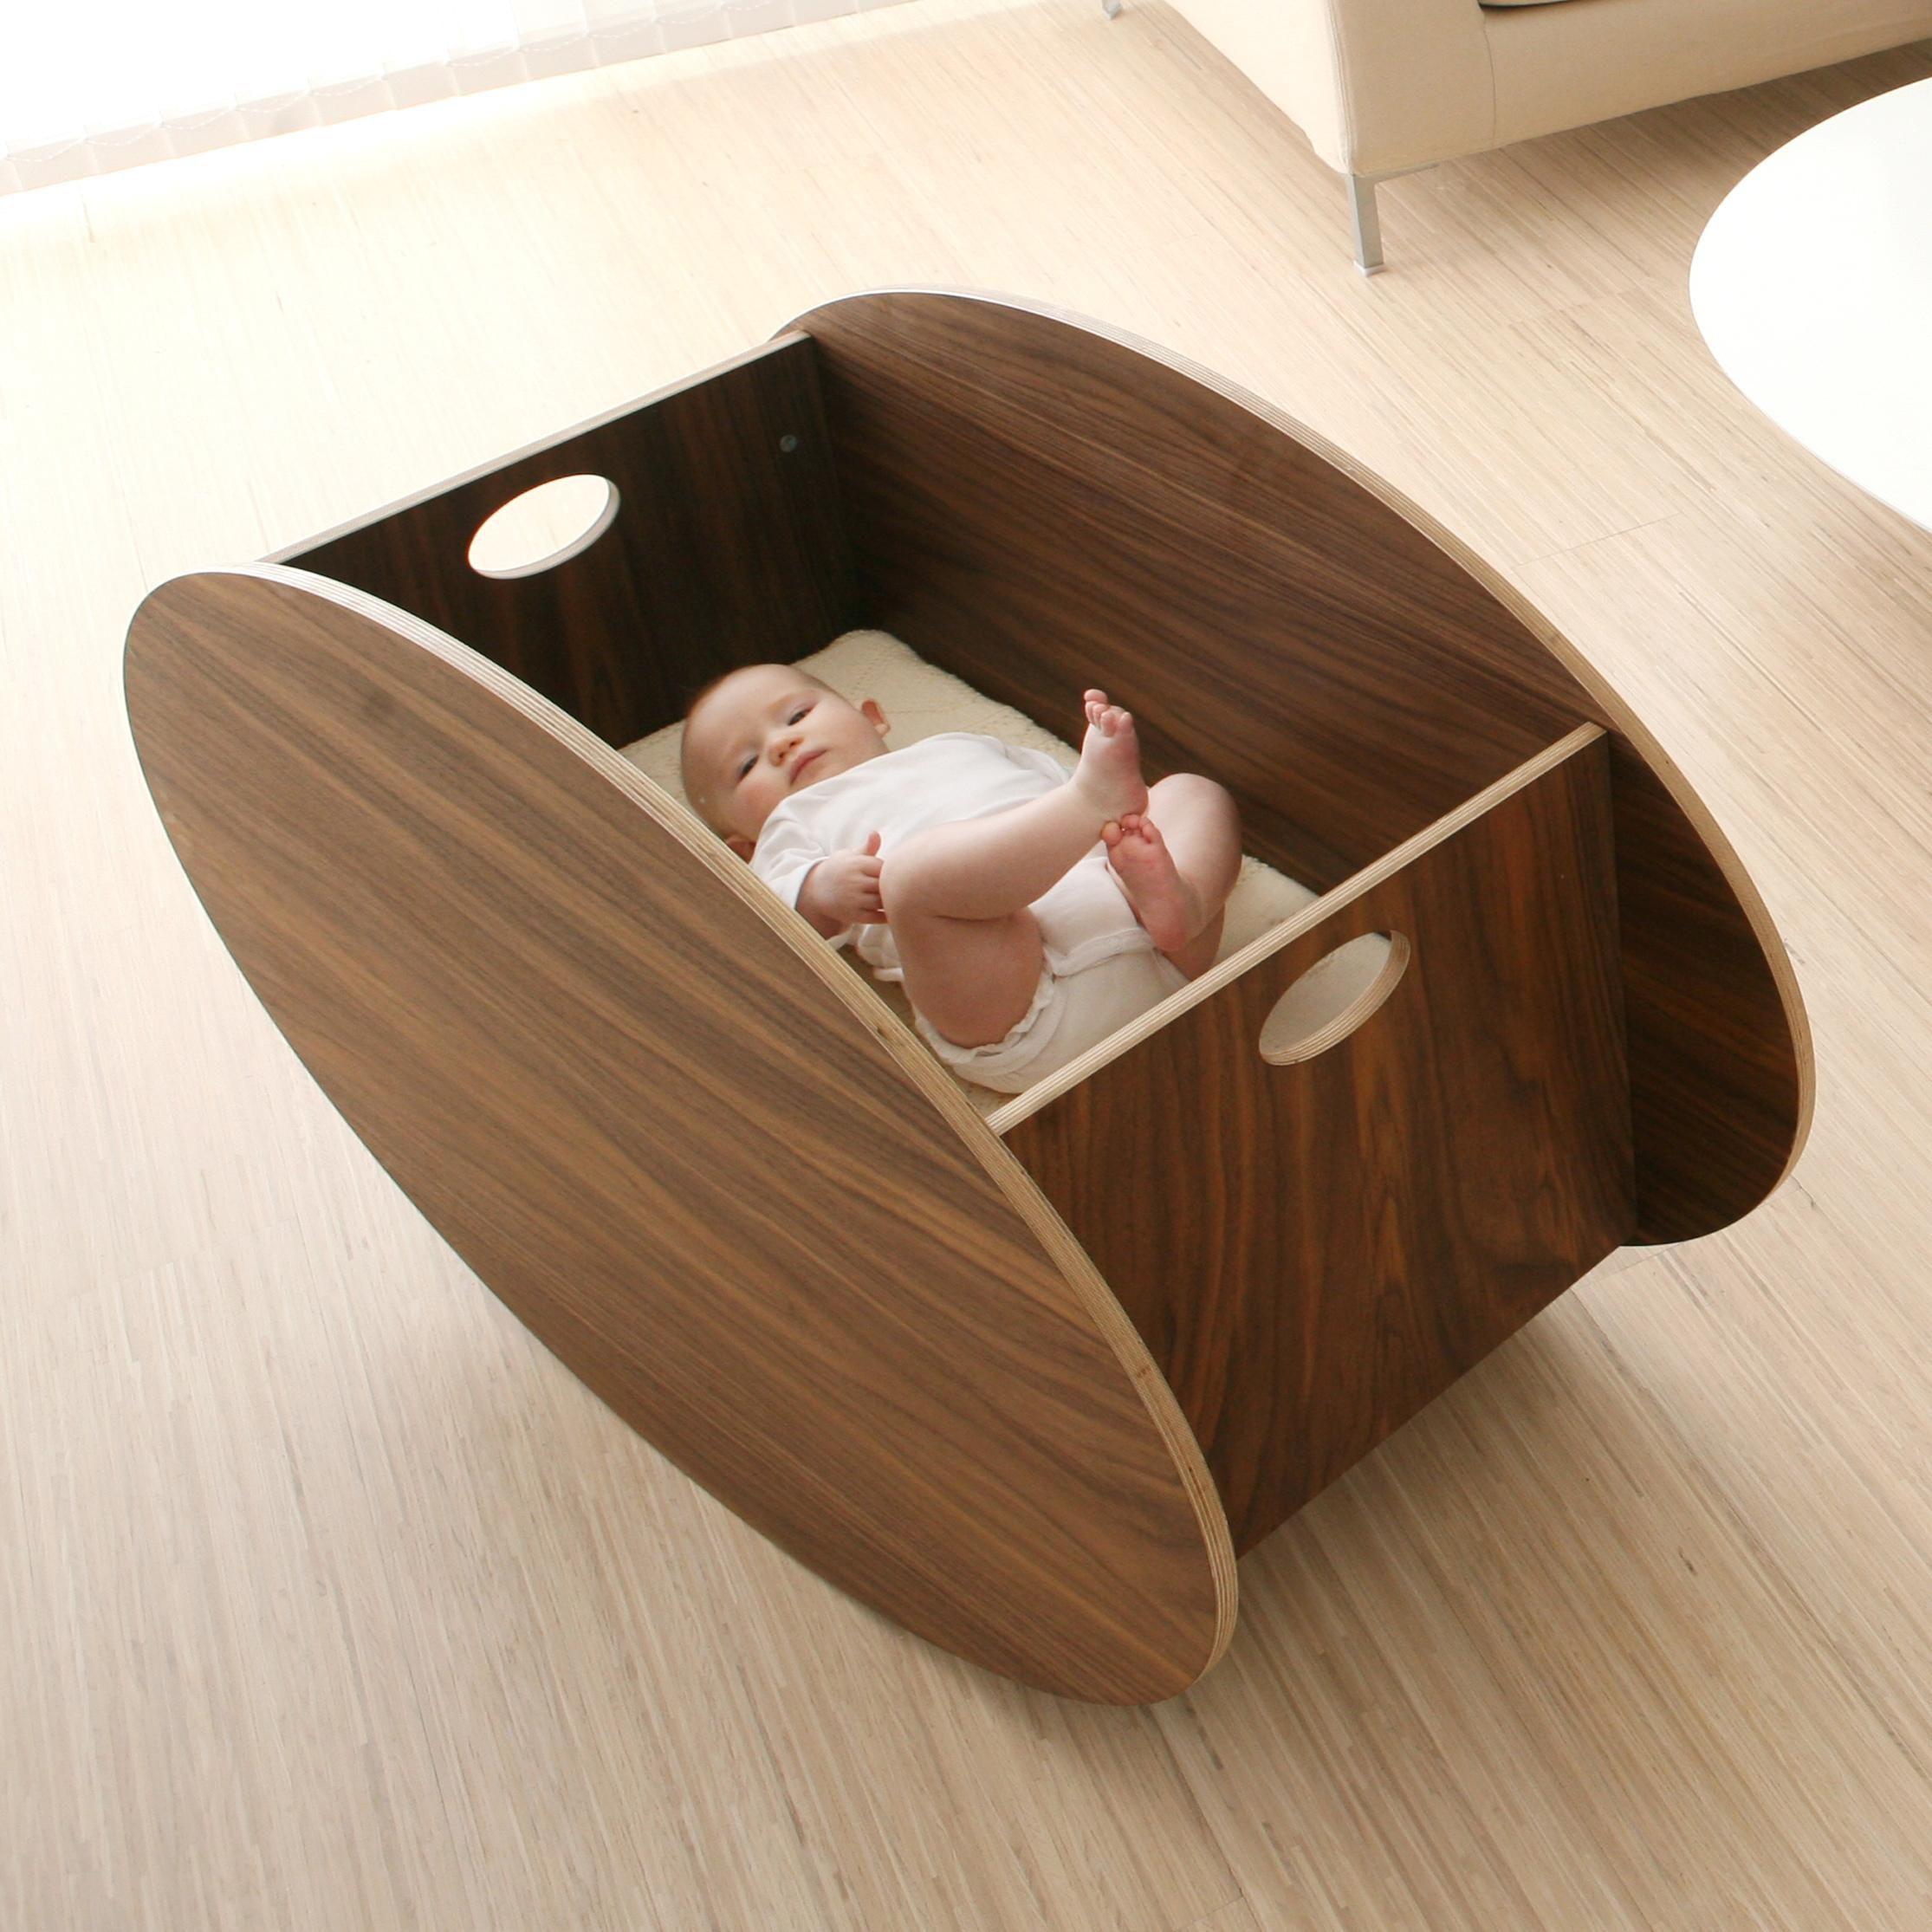 So-ro cradle. | Oh baby baby | Pinterest | Madera